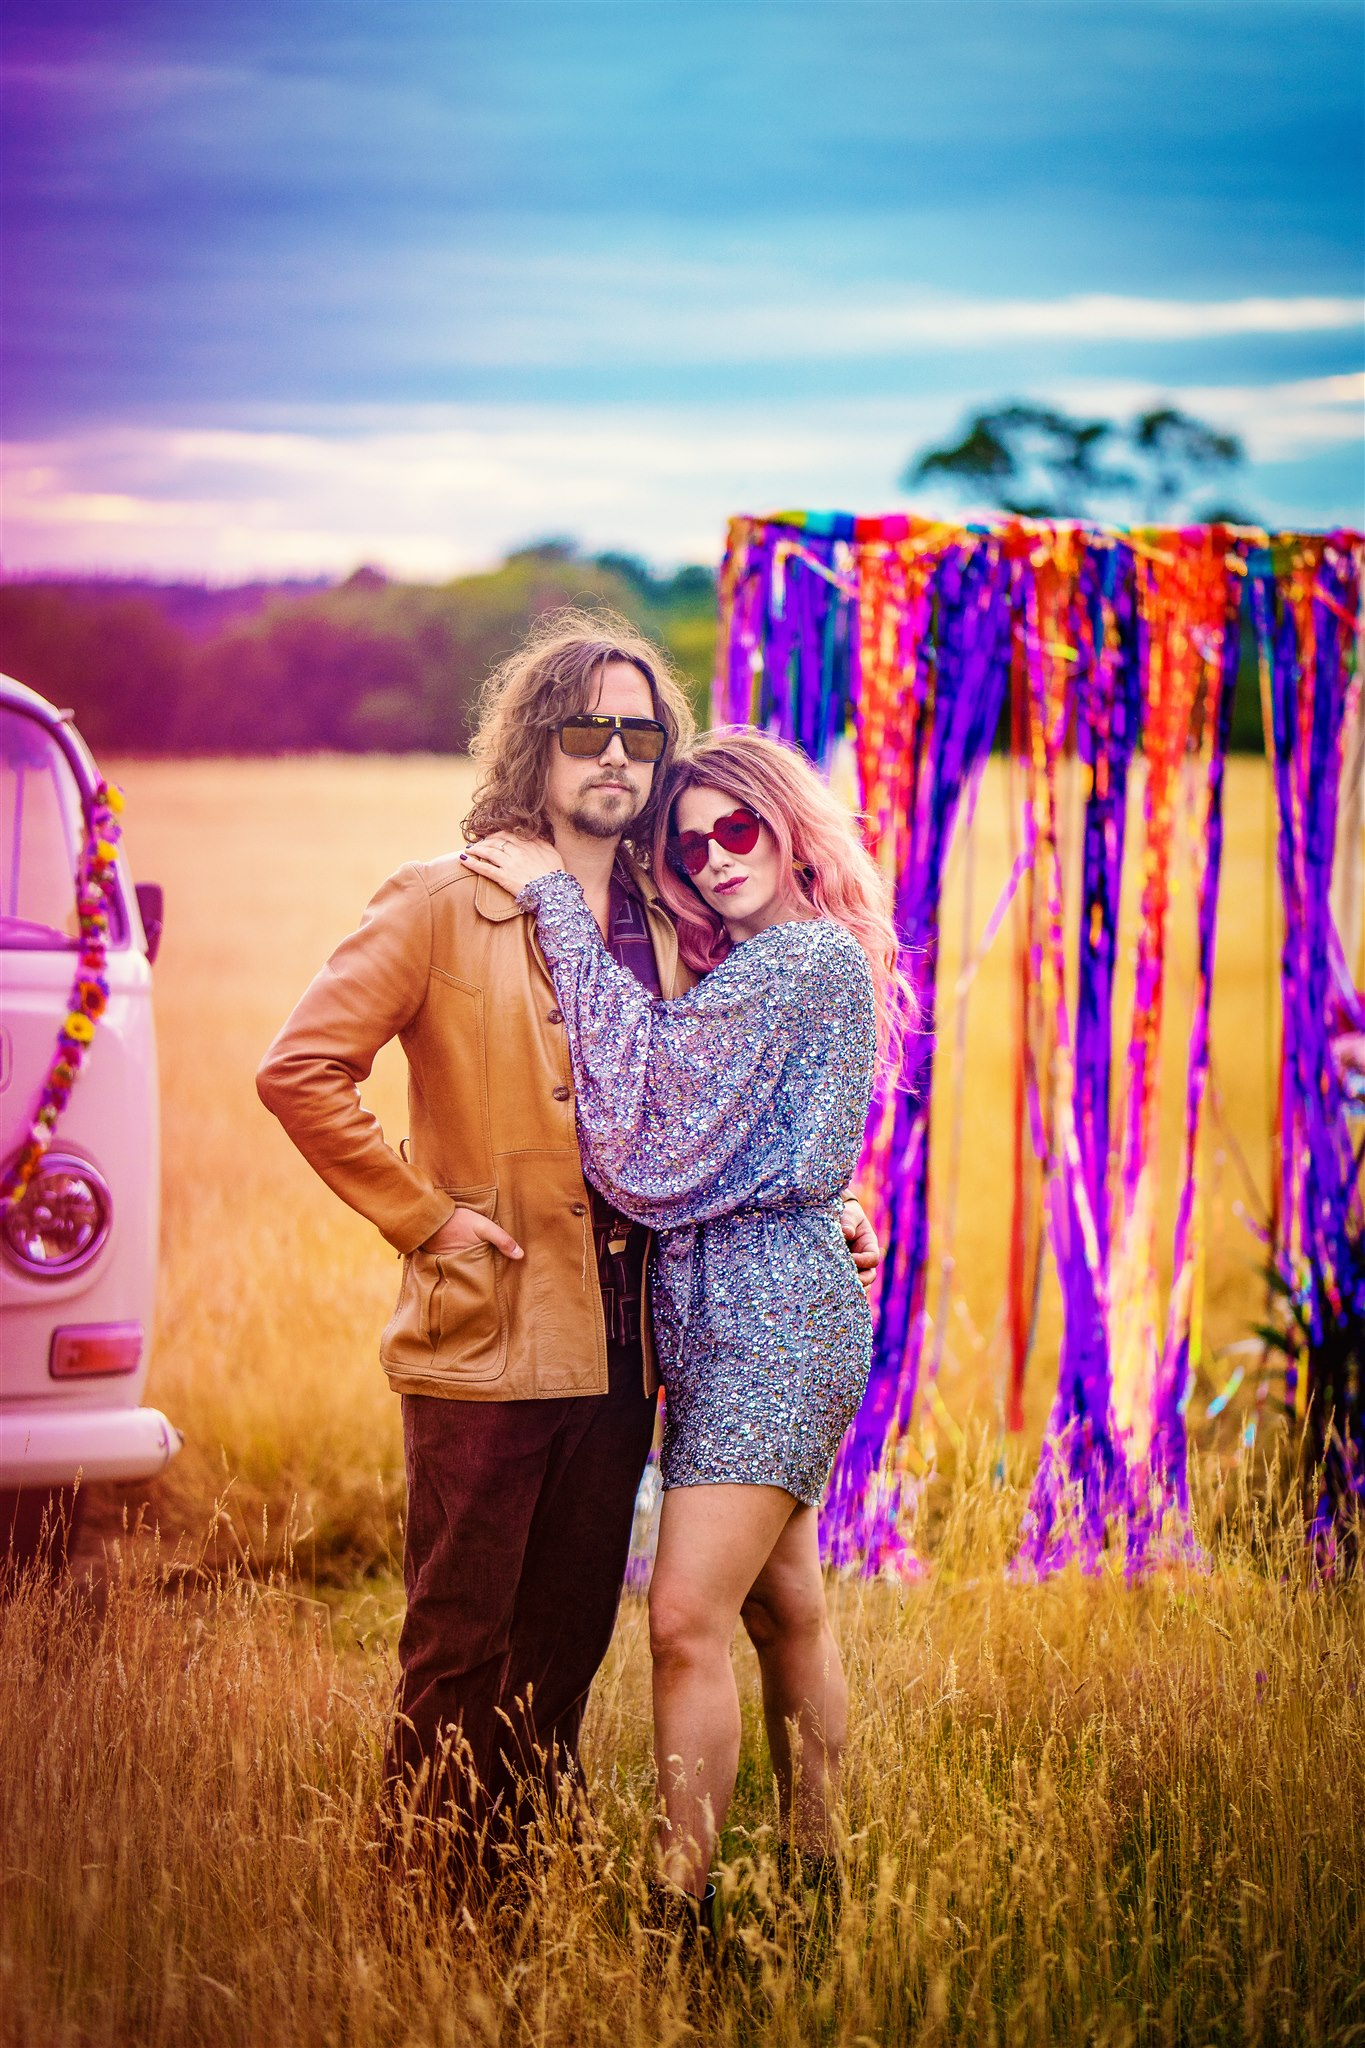 funky elopement photoshoot - colourful bohemian wedding - 70s wedding - campervan wedding - hippie wedding